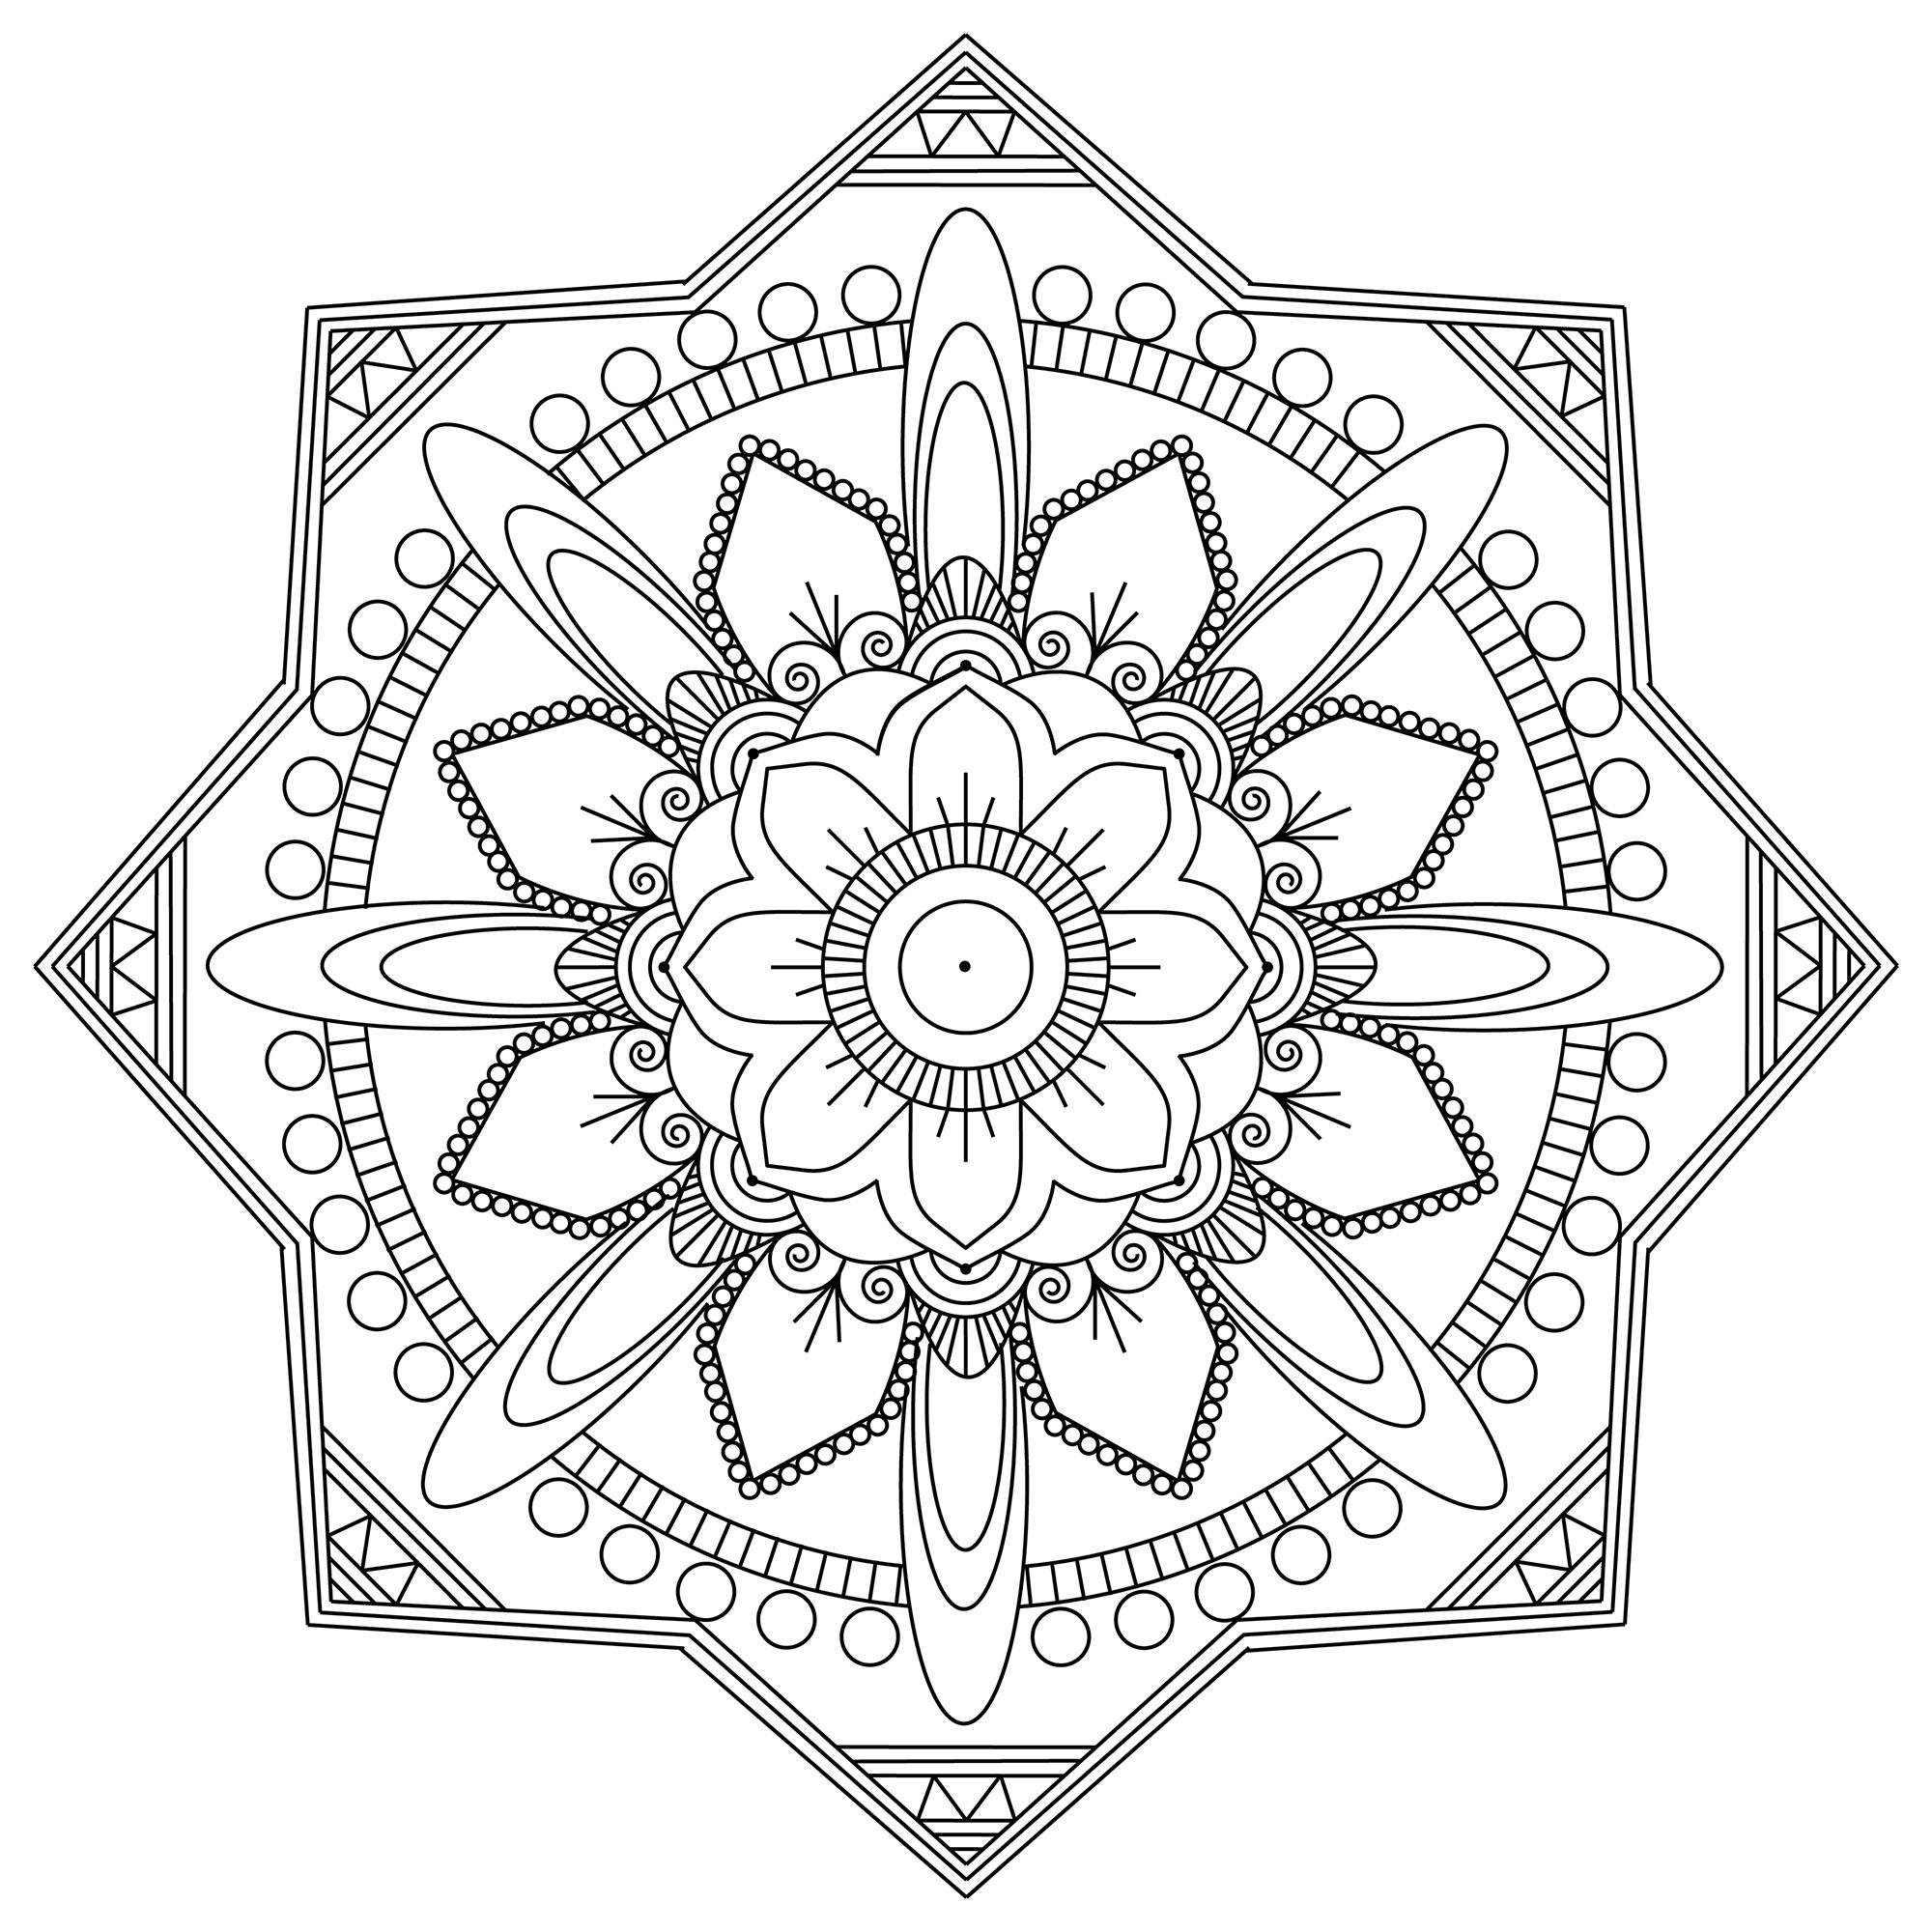 Colorear para adultos : Mandalas - 196